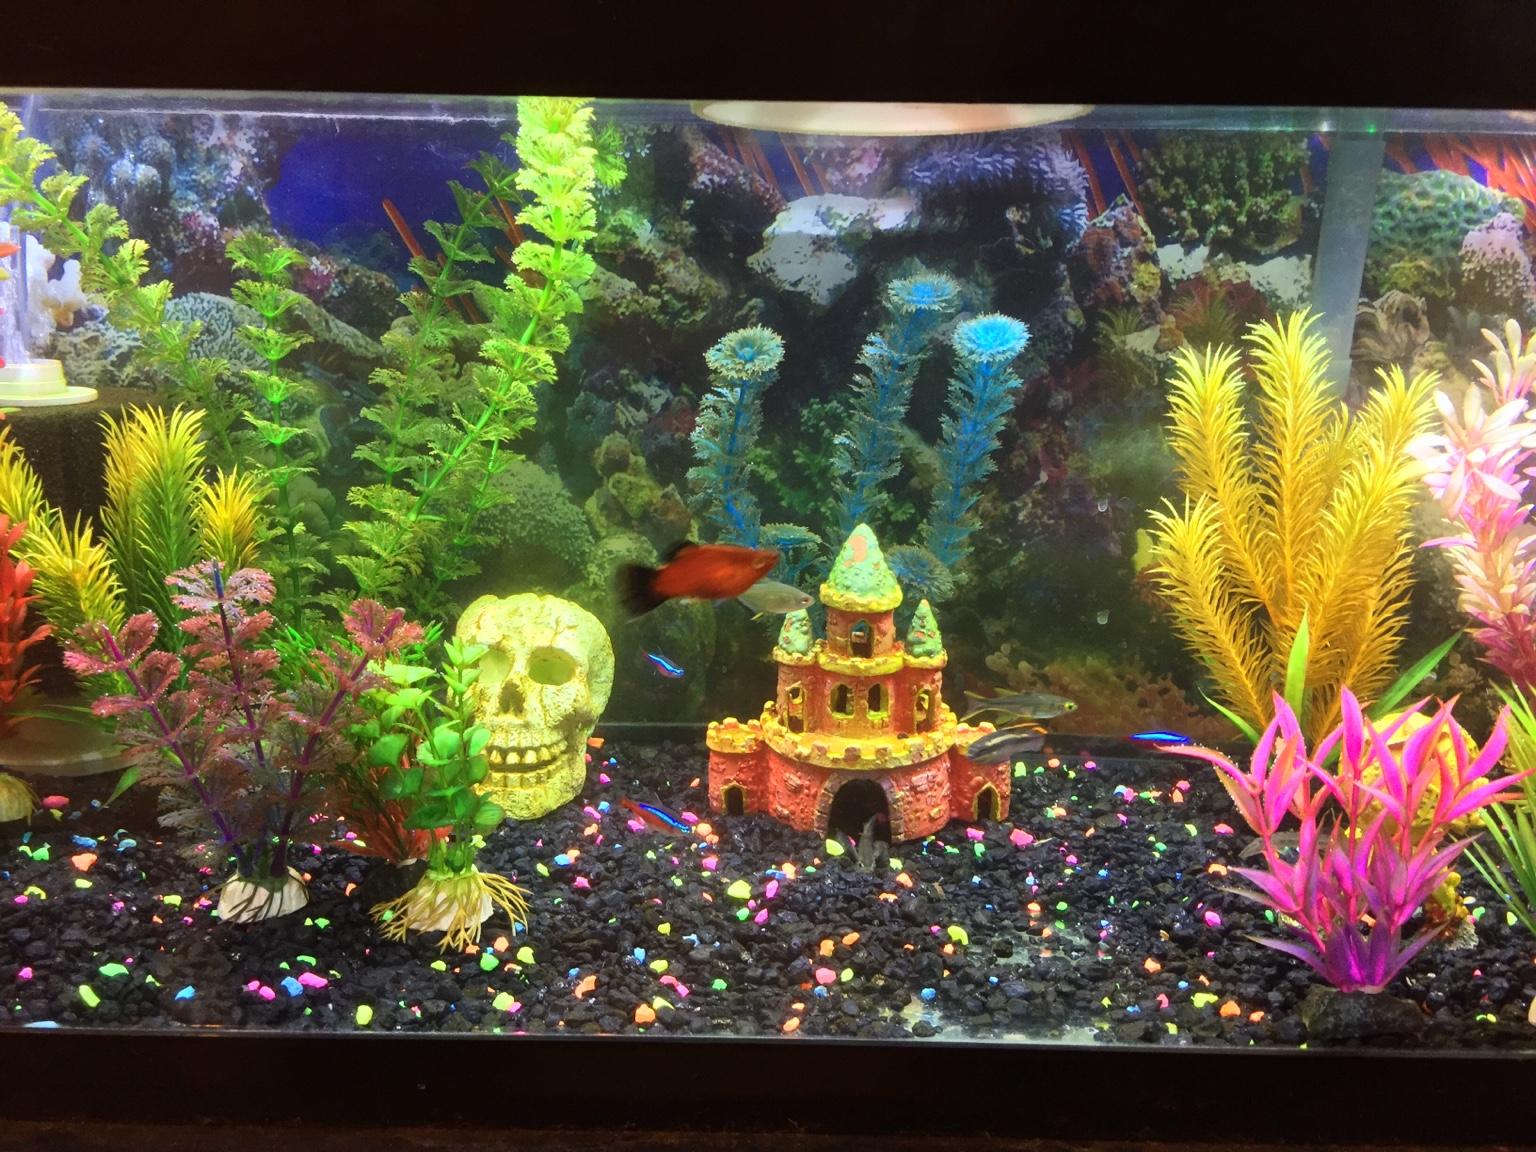 Freshwater aquarium fish water change - Cloudy Water After Water Change